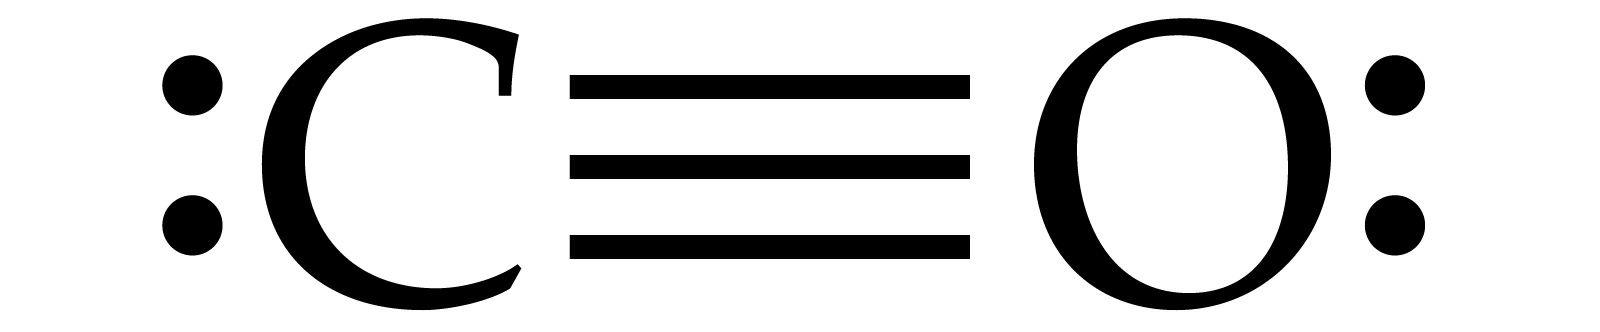 What Is The Lewis Dot Structure For Carbon Monoxide Socratic